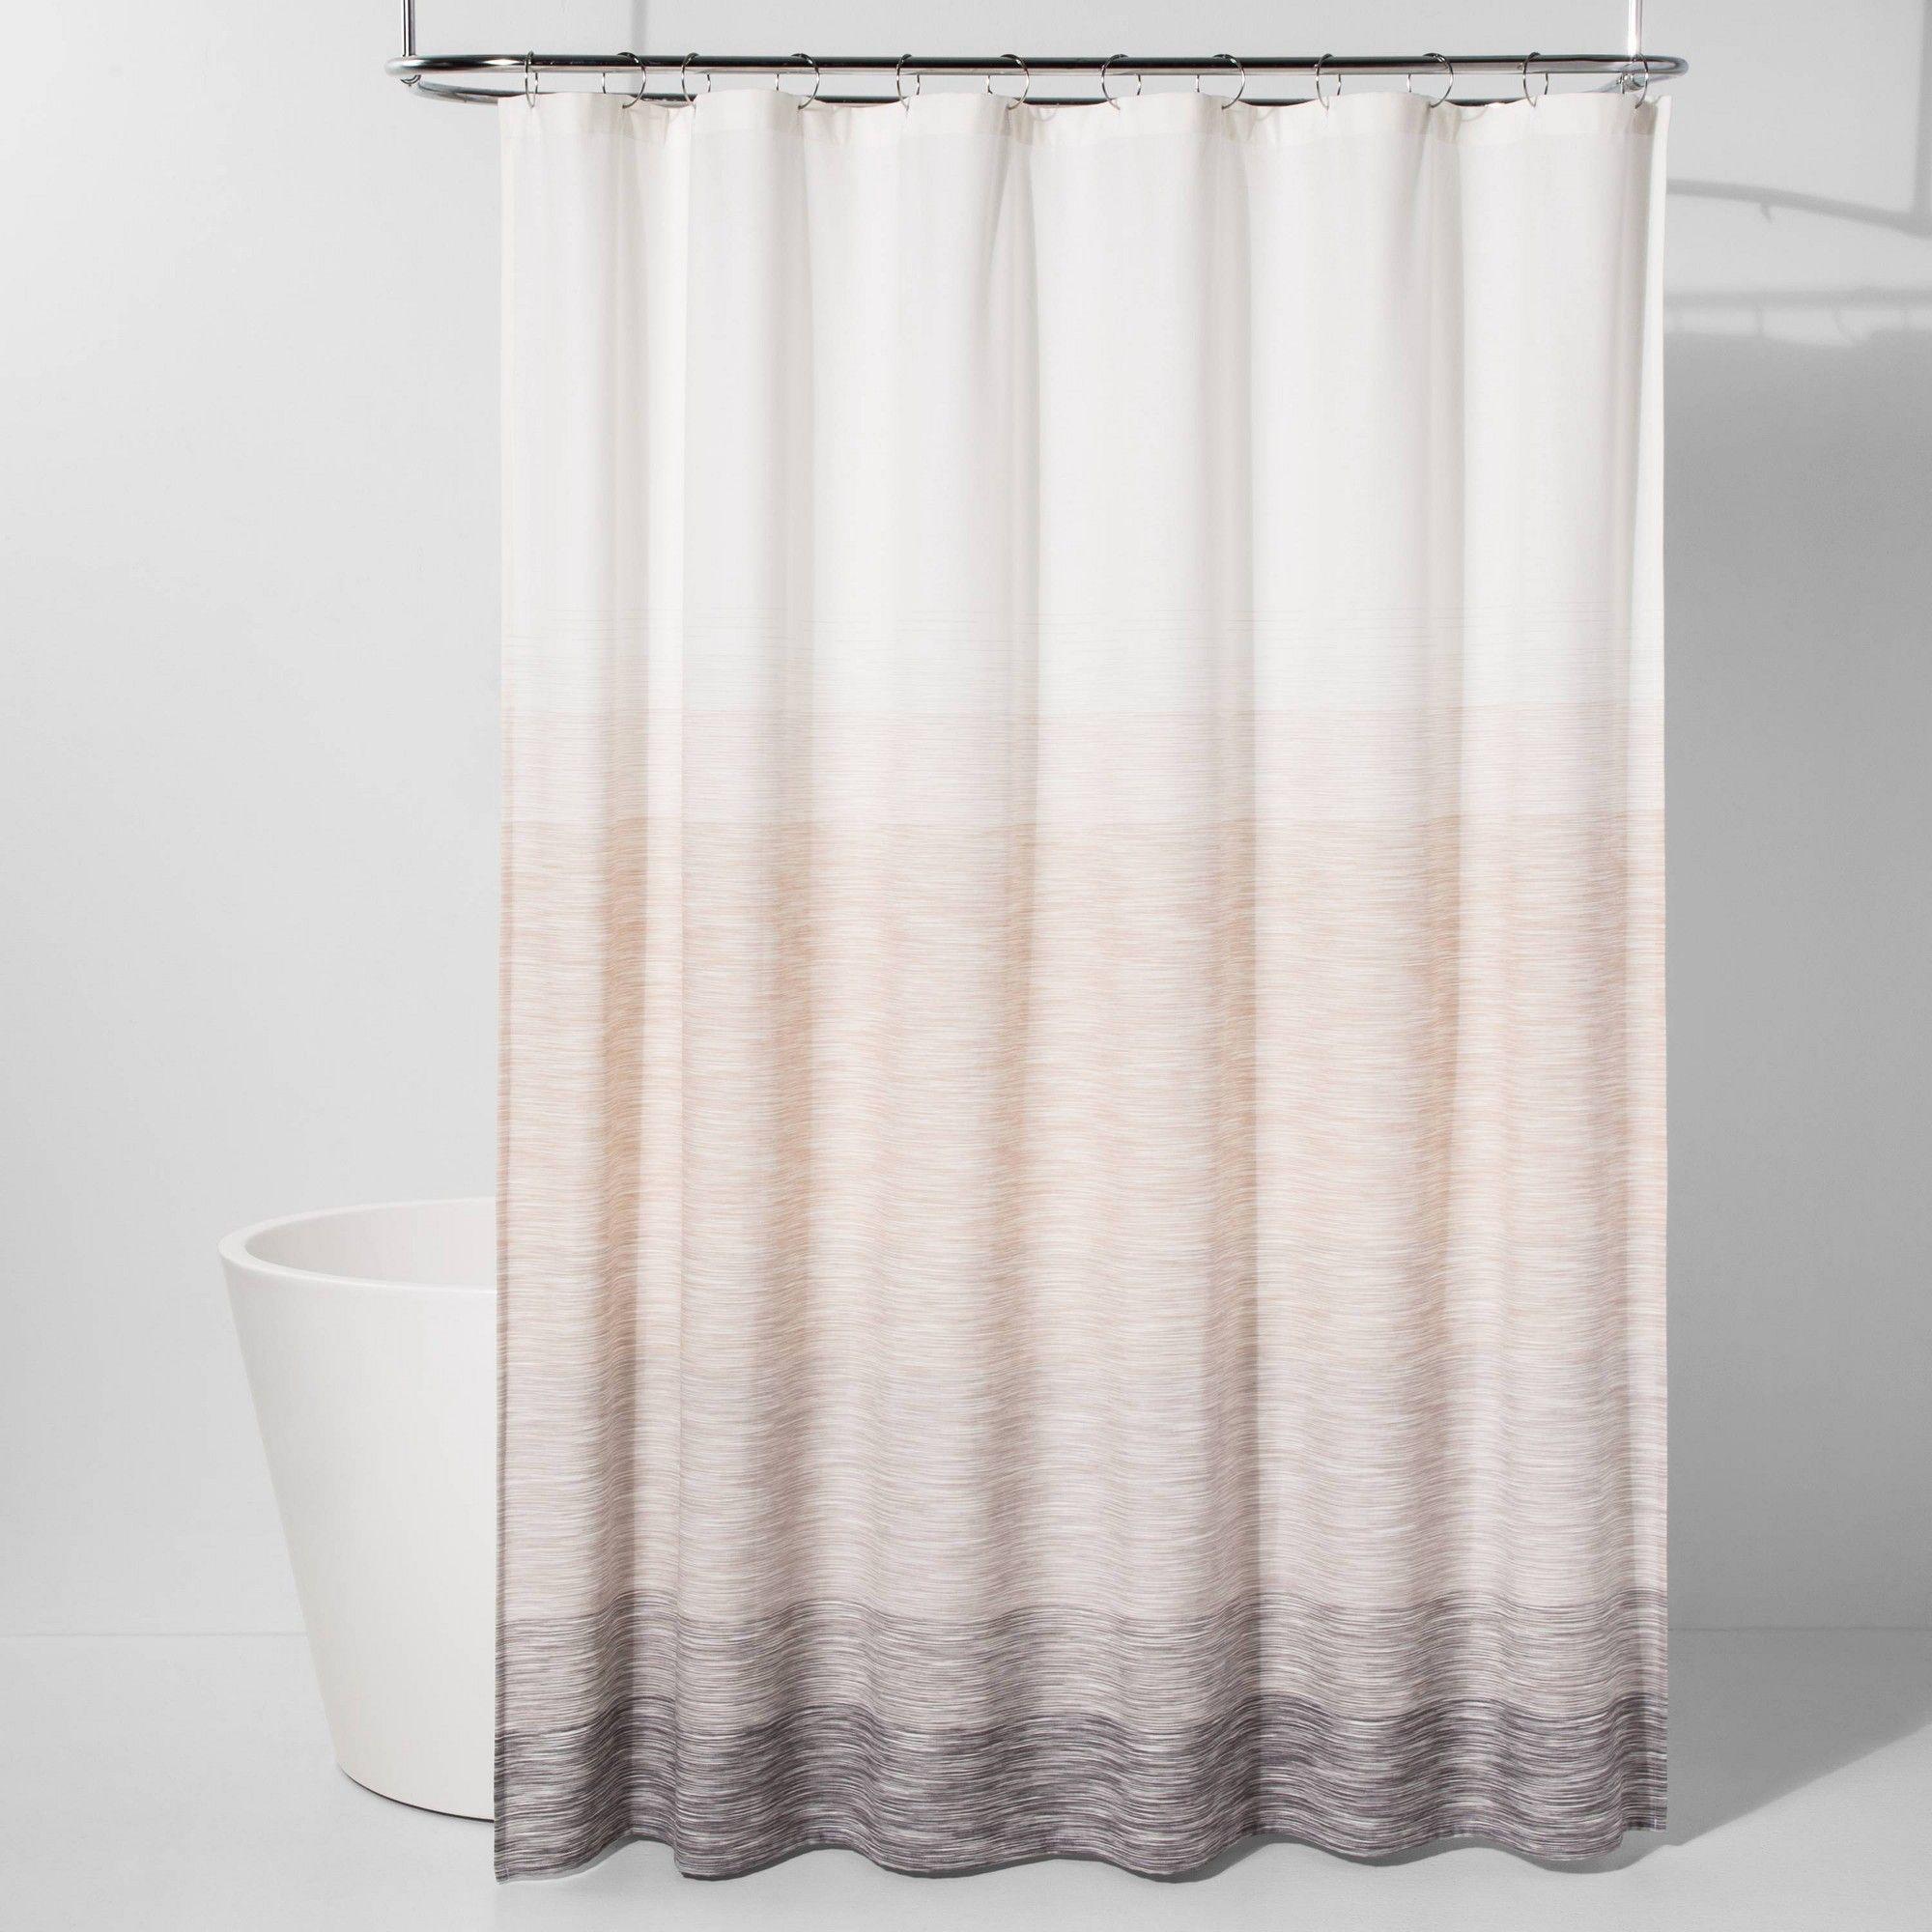 Spacedye Shower Curtain Neutral Ombre Project 62 Beige